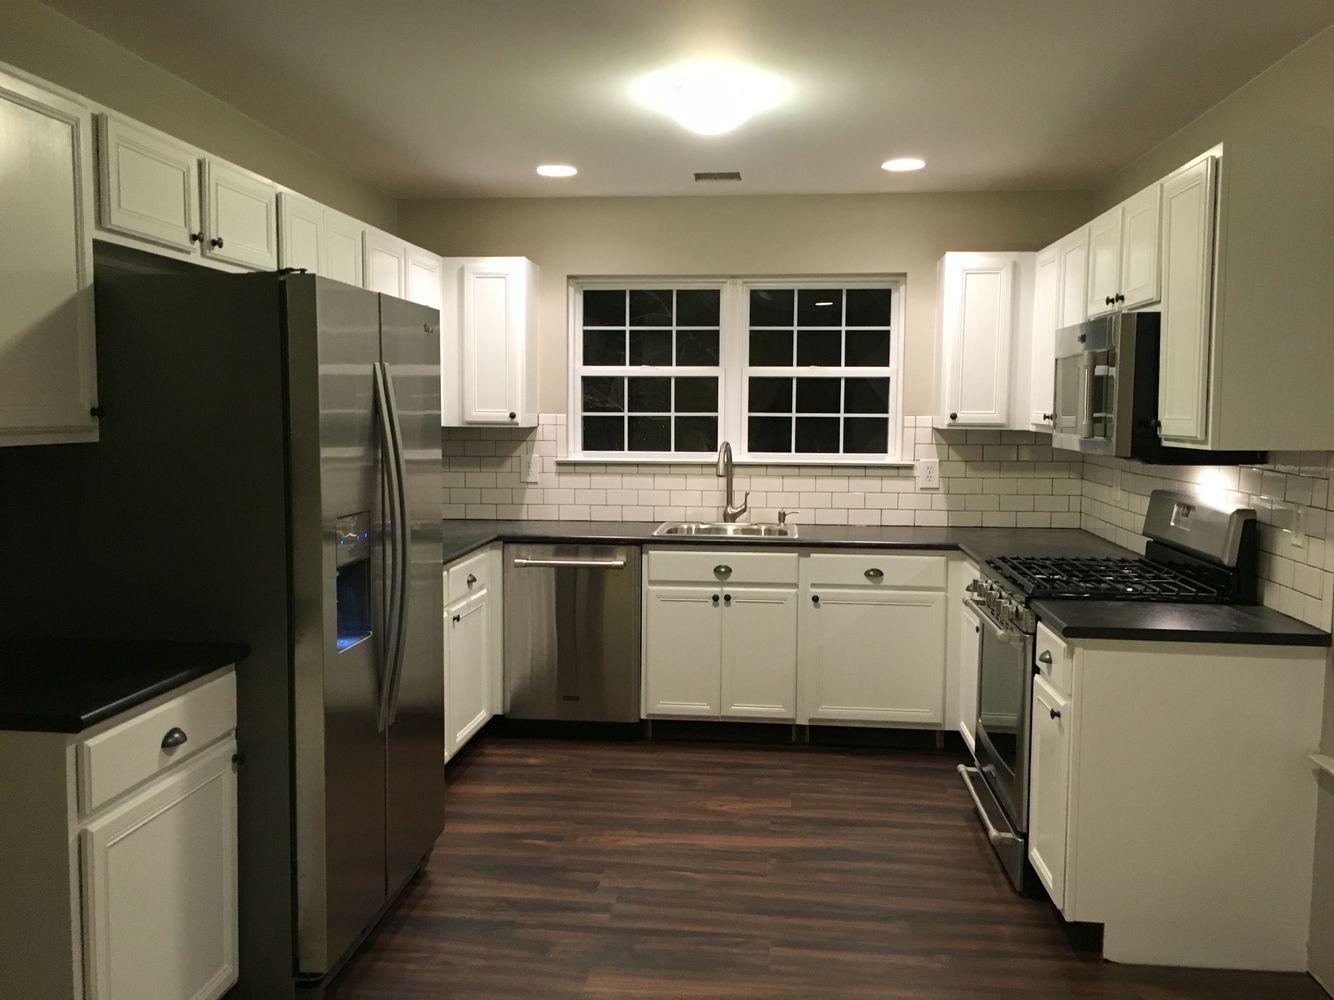 Timeless Kitchen. White Subway tile backsplash with dark